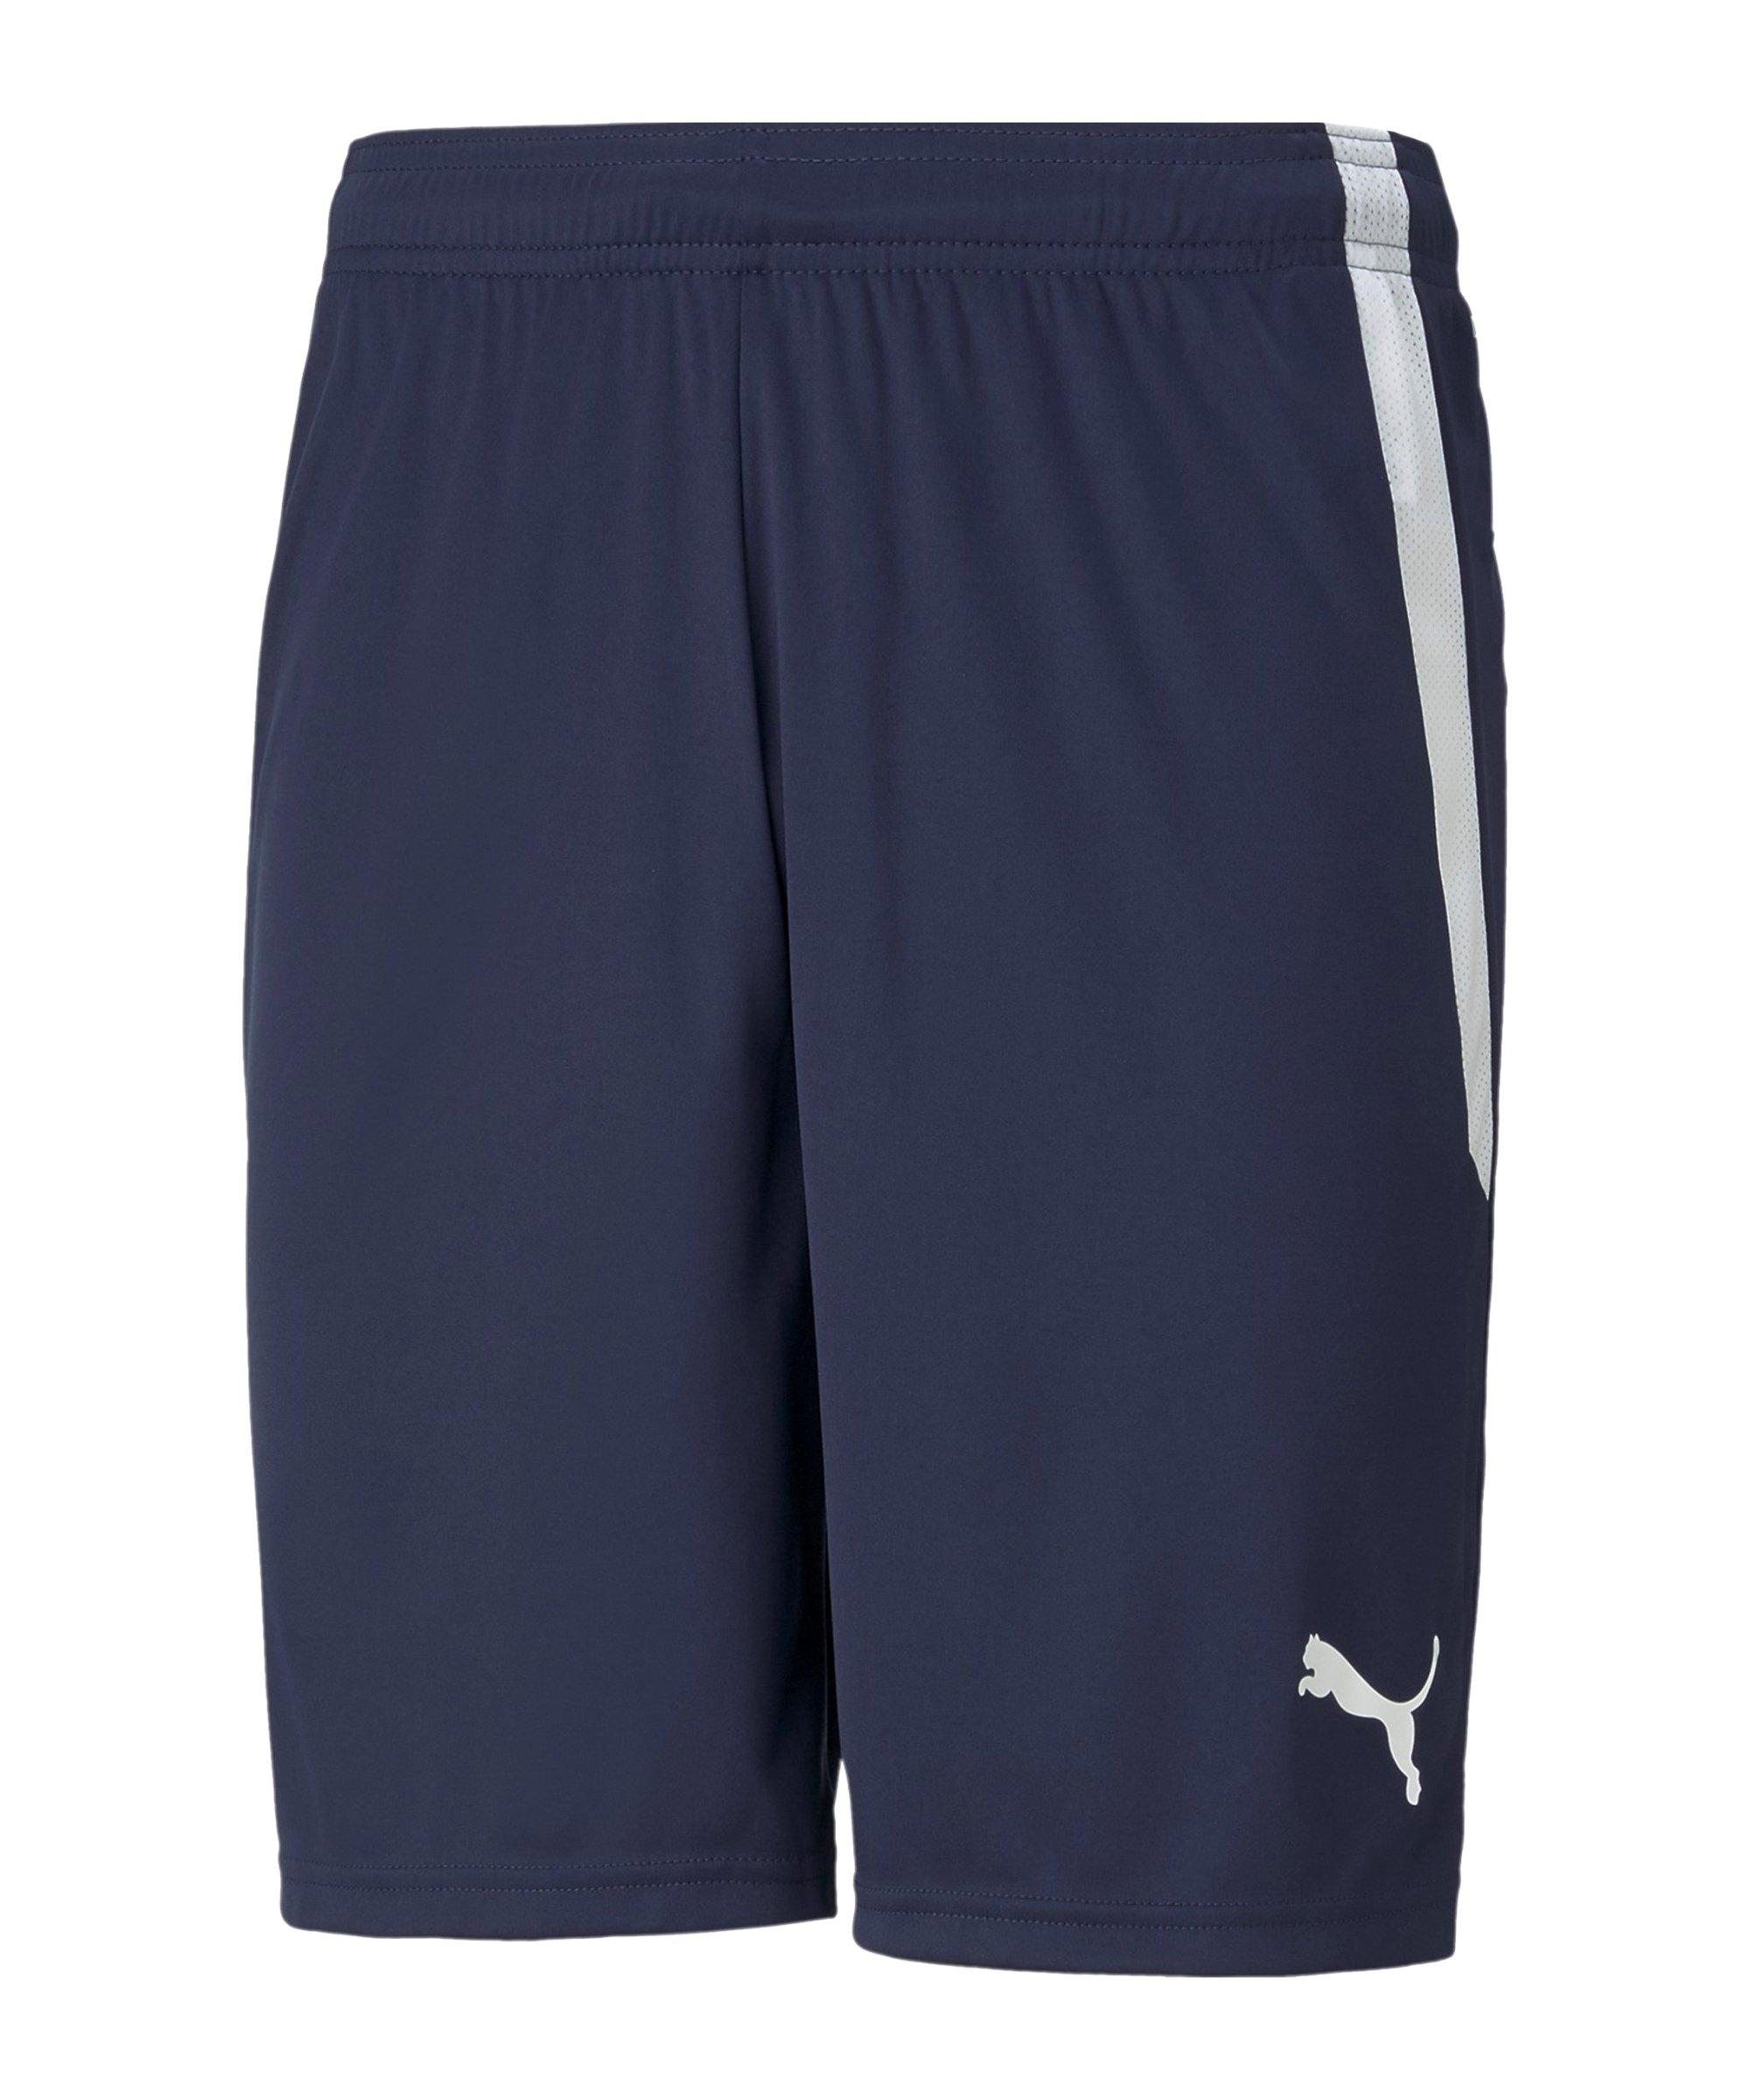 PUMA teamLIGA Shorts Blau F06 - blau